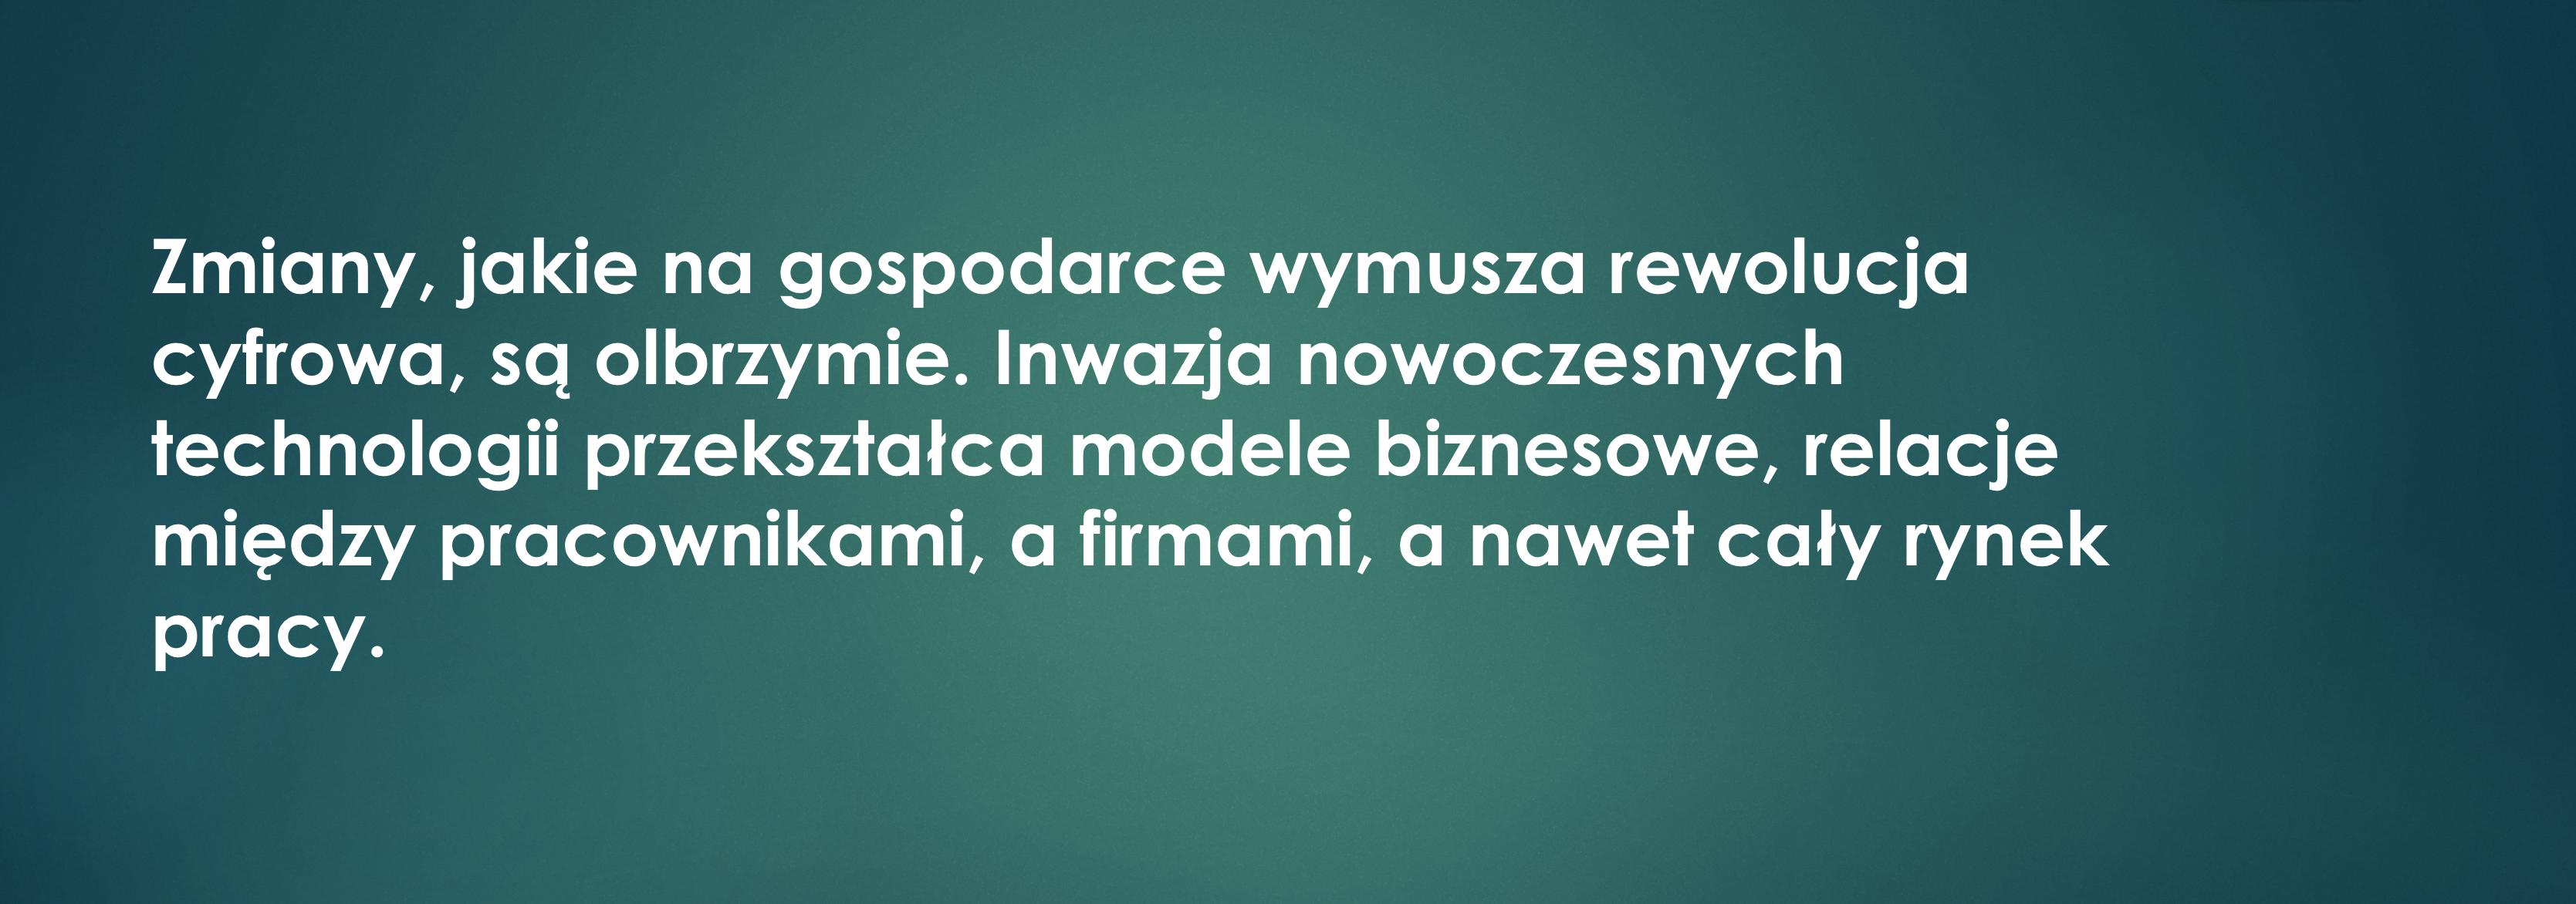 Norbert Biedrzycki changes_2 - pol